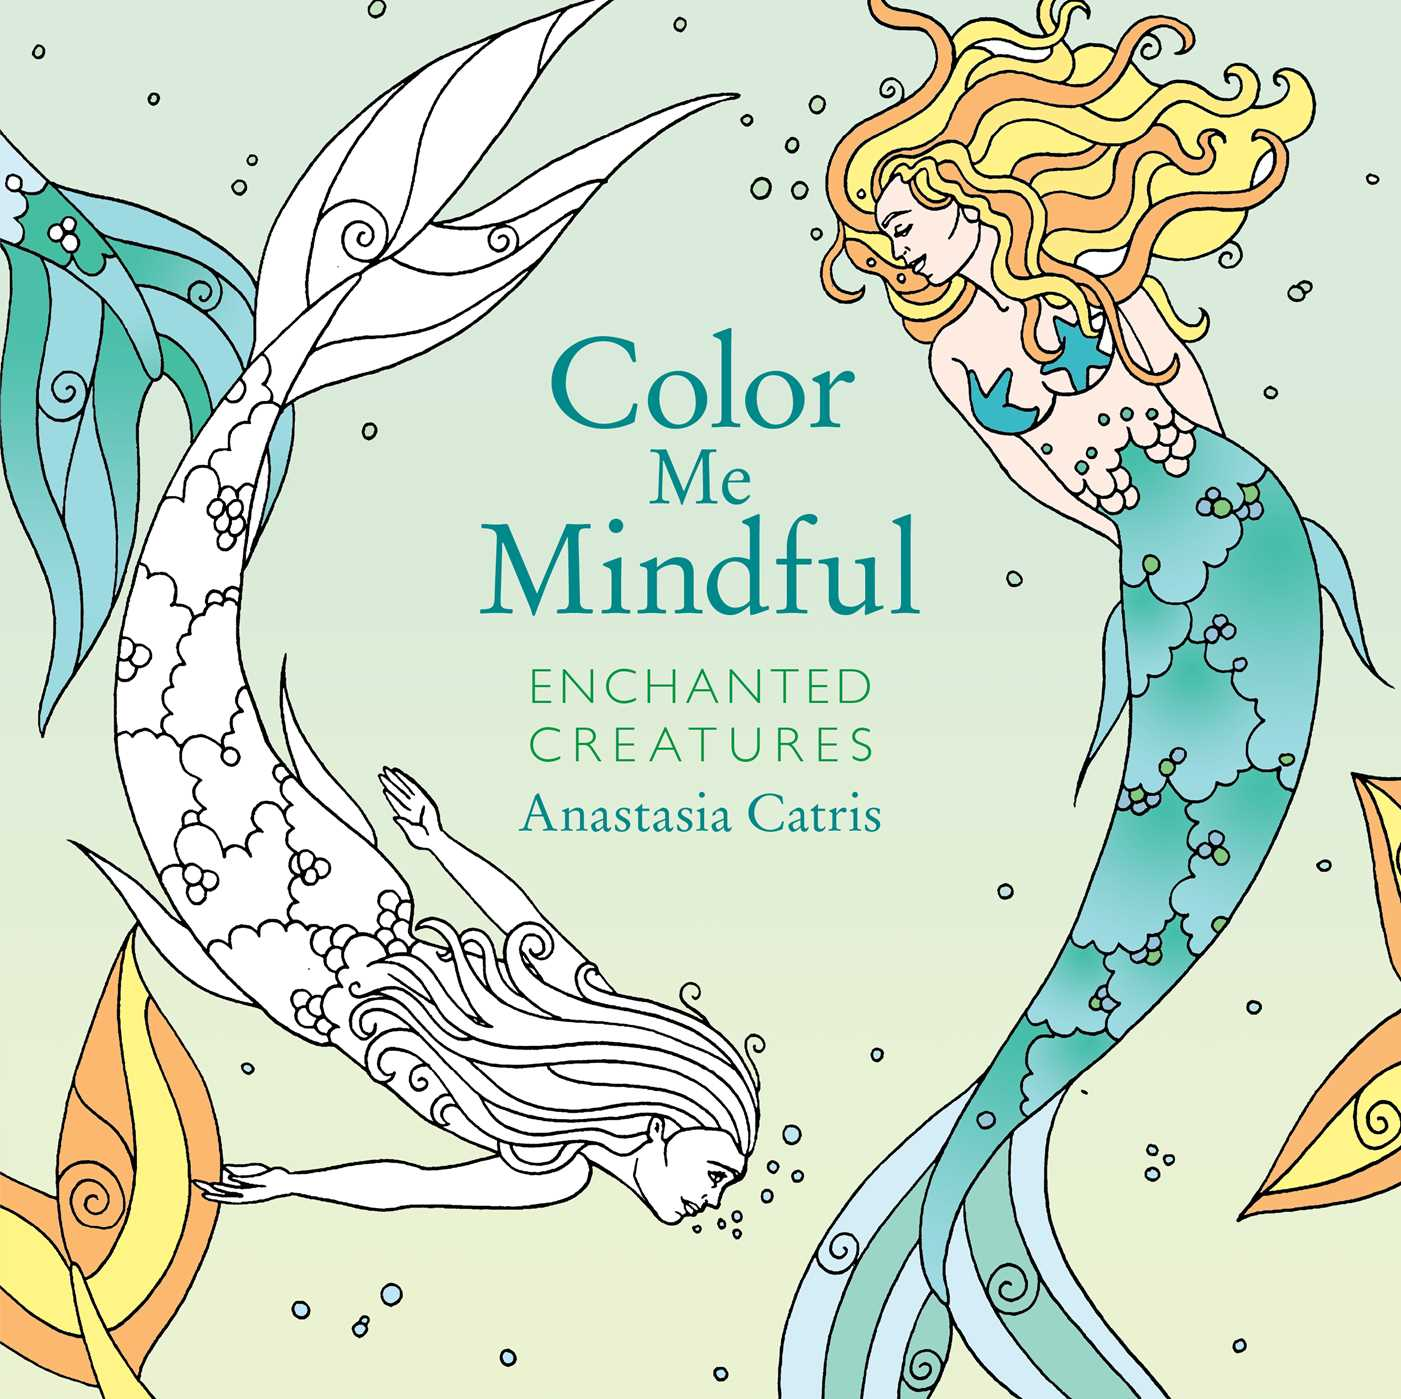 Color me mindful enchanted creatures 9781501162367 hr